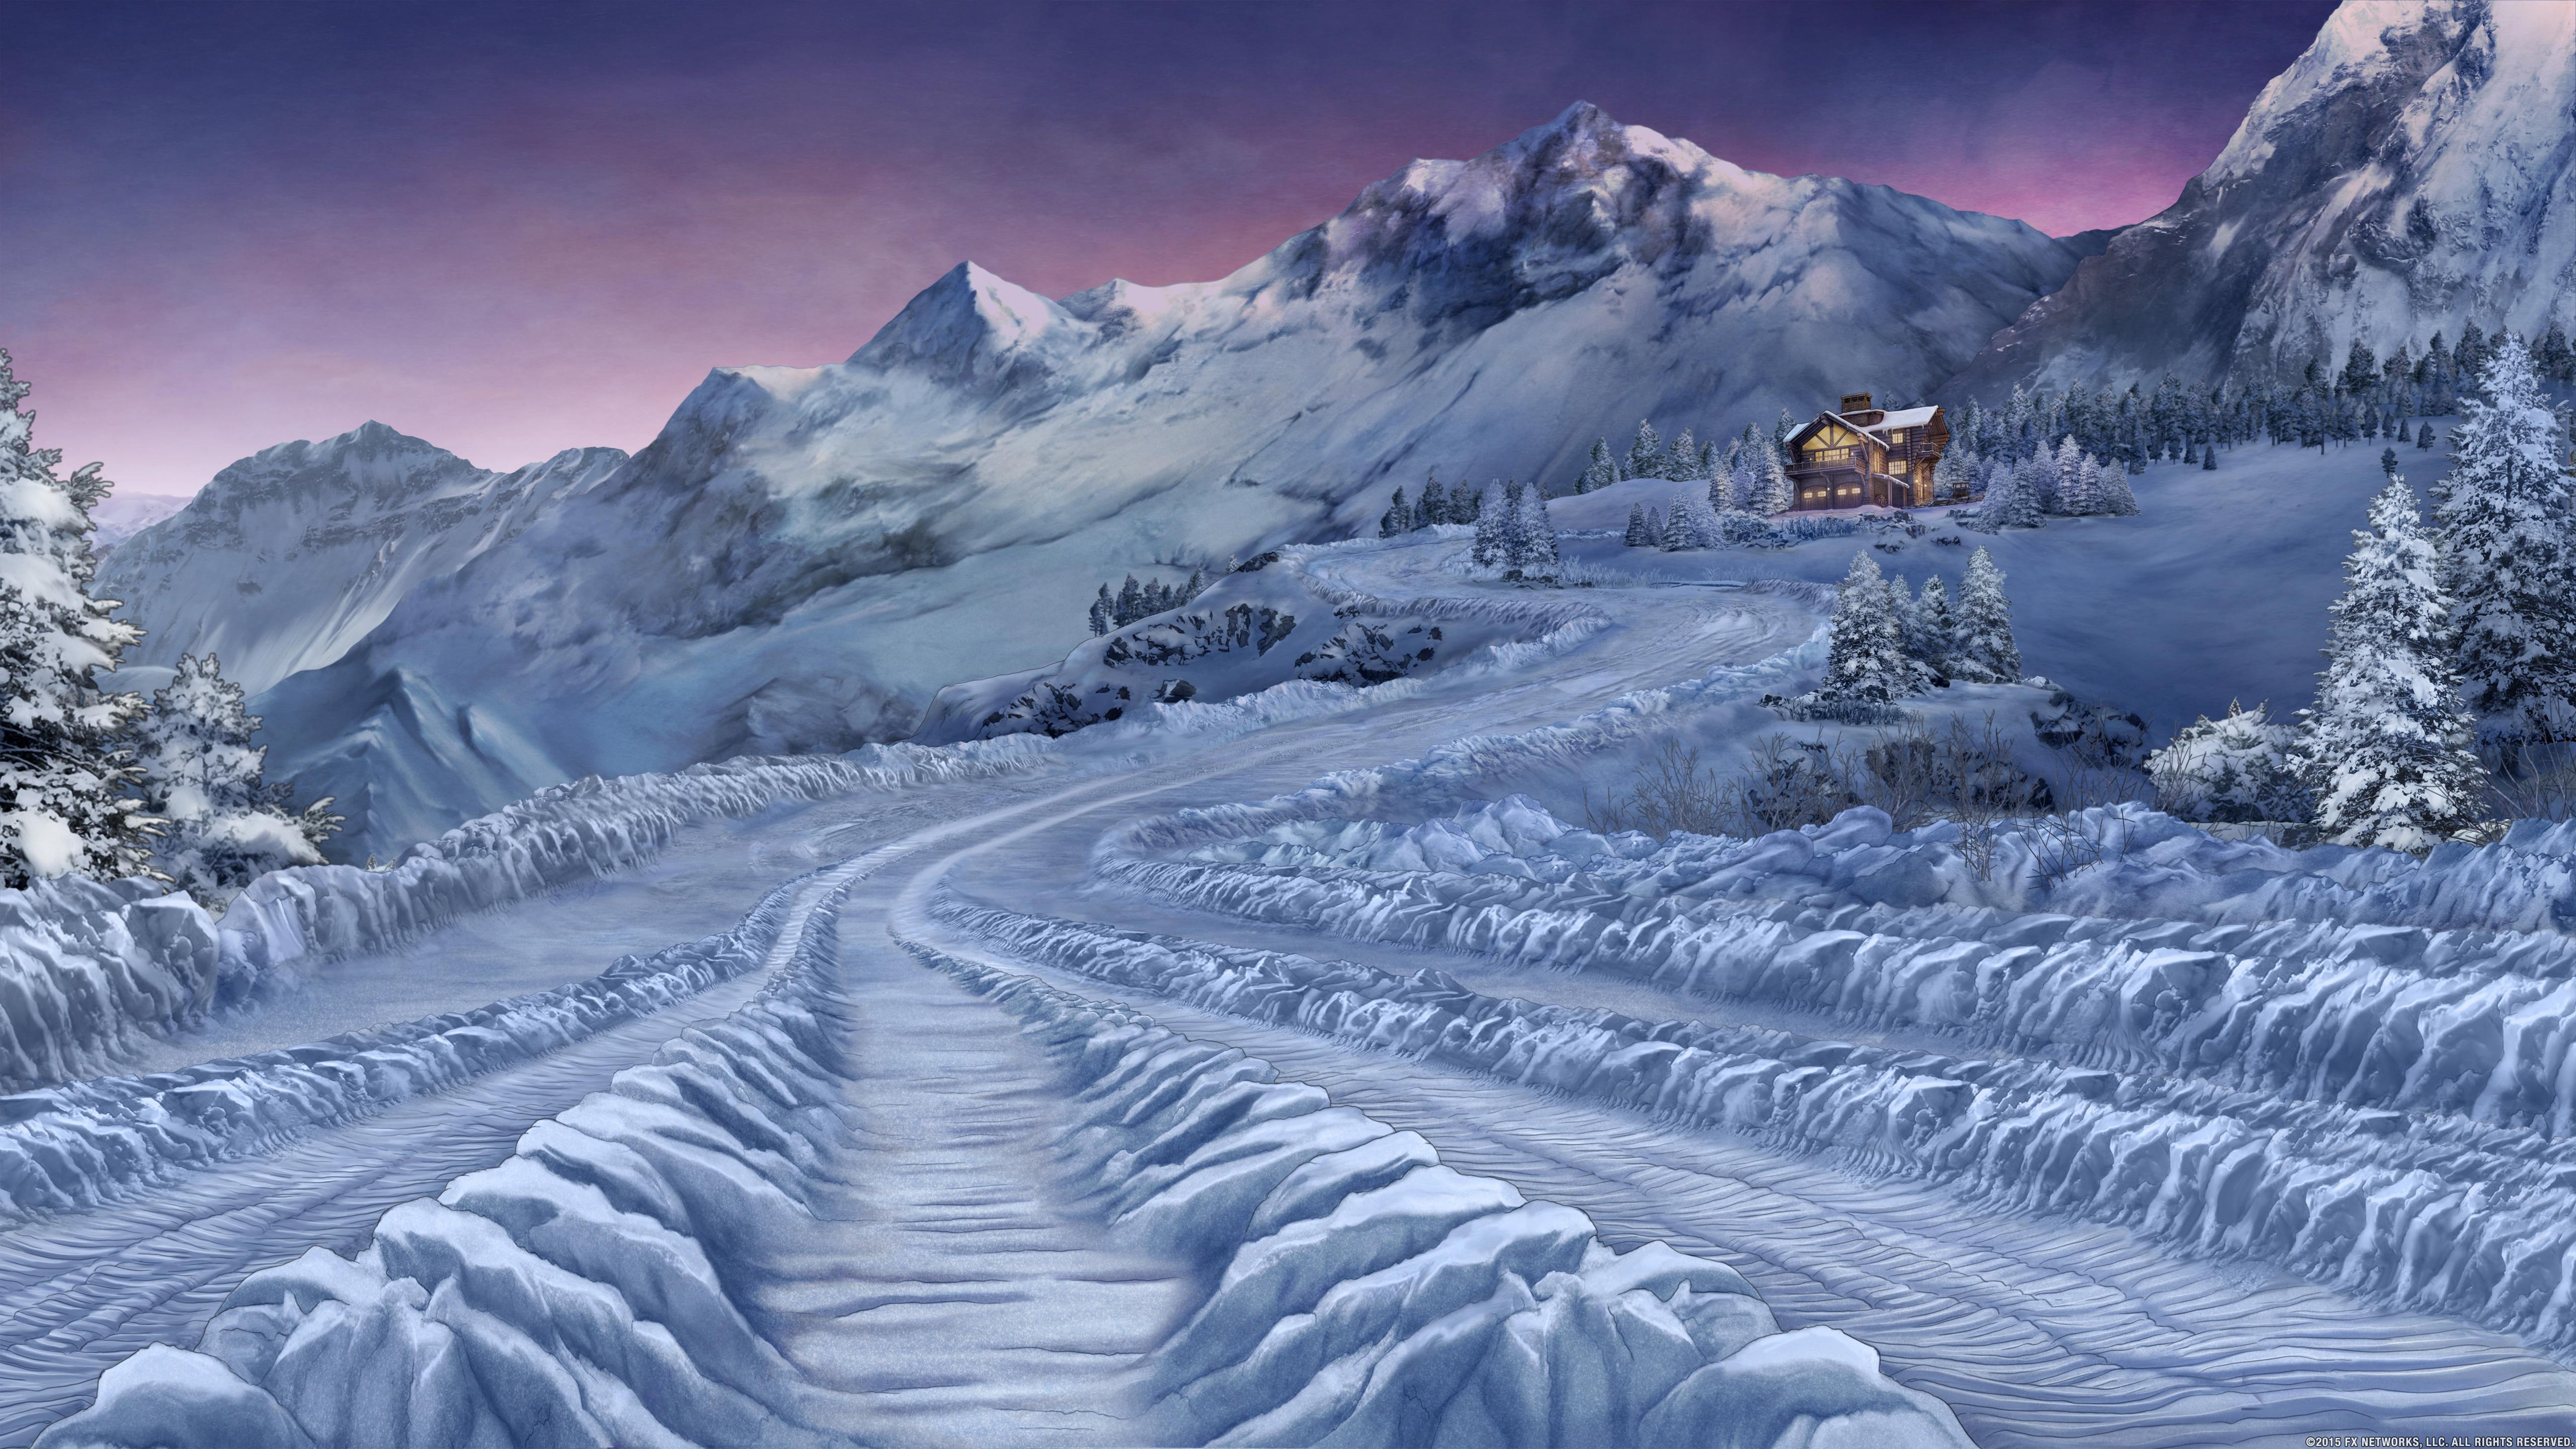 Winter wallpaper 5120x2880